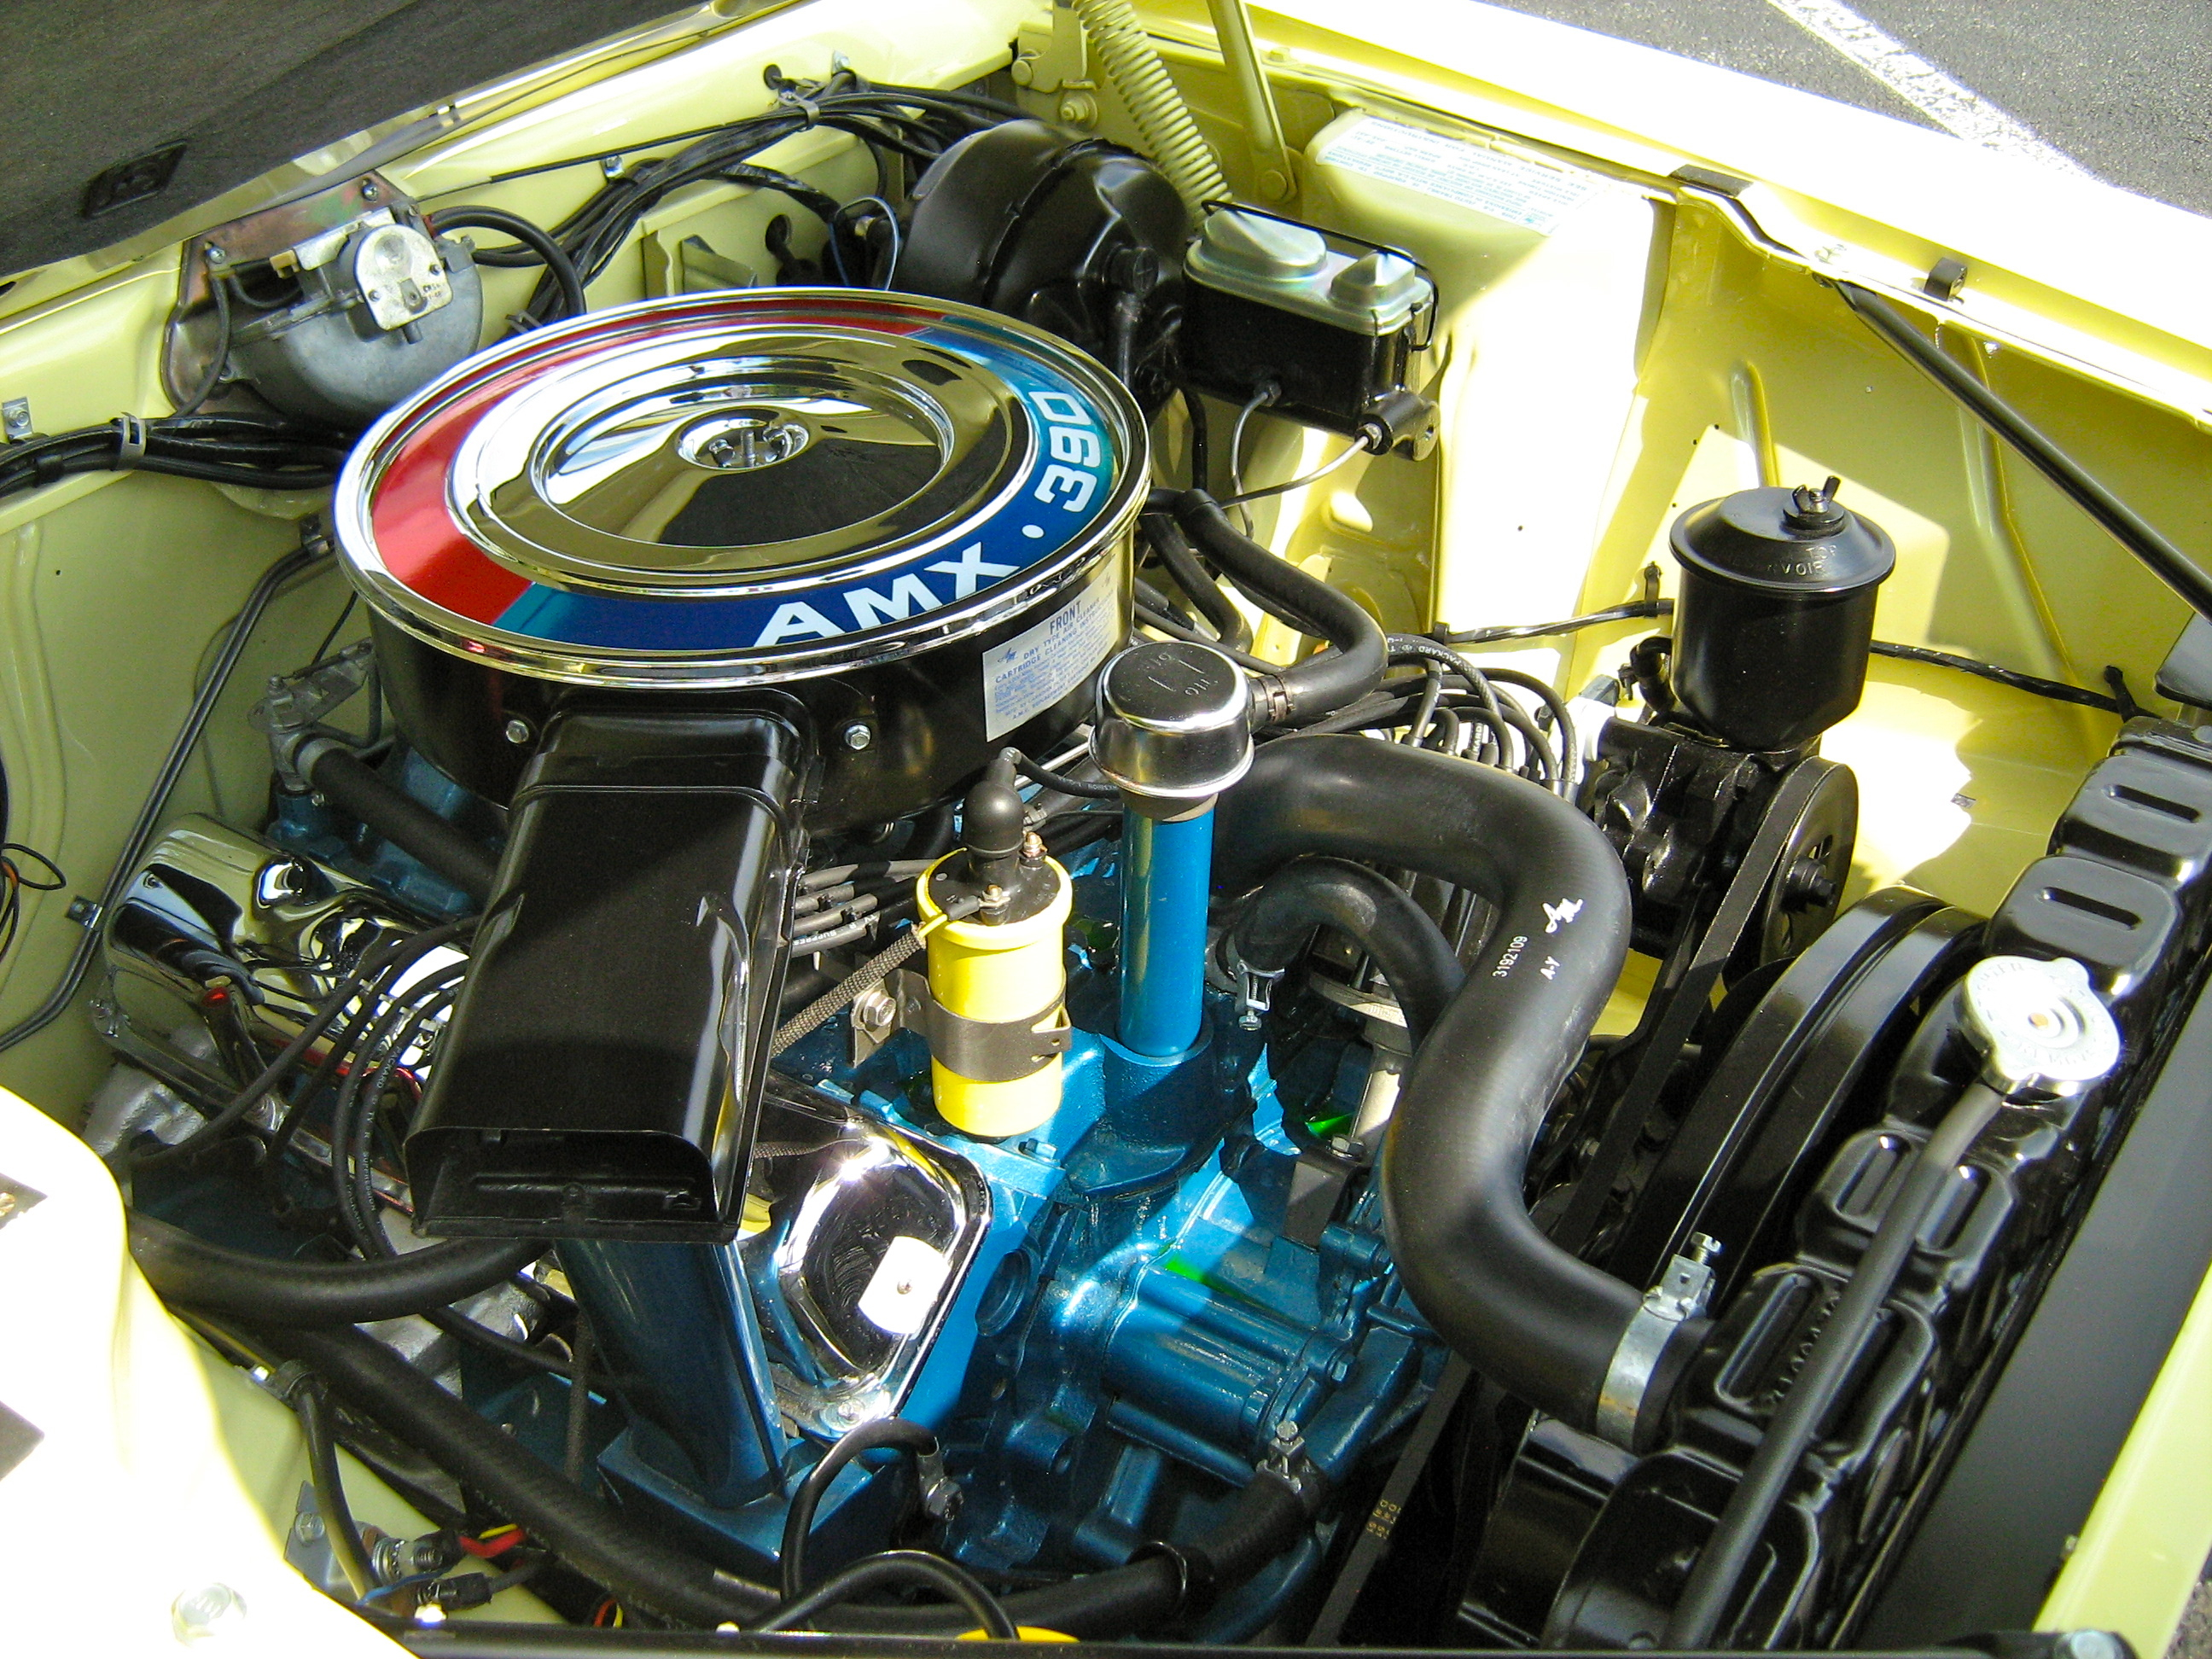 Amc Amx Wiring Harness Cadillac Color 1958 Diagram File1968 Yellow 390 Auto Mder Wikimedia